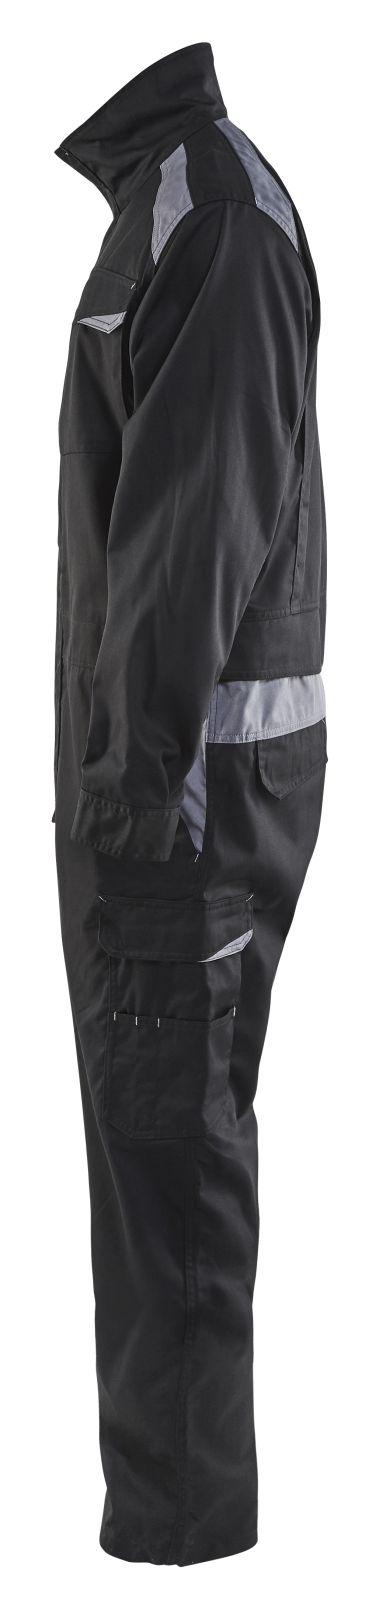 Blaklader Overalls 60541800 zwart-grijs(9994)